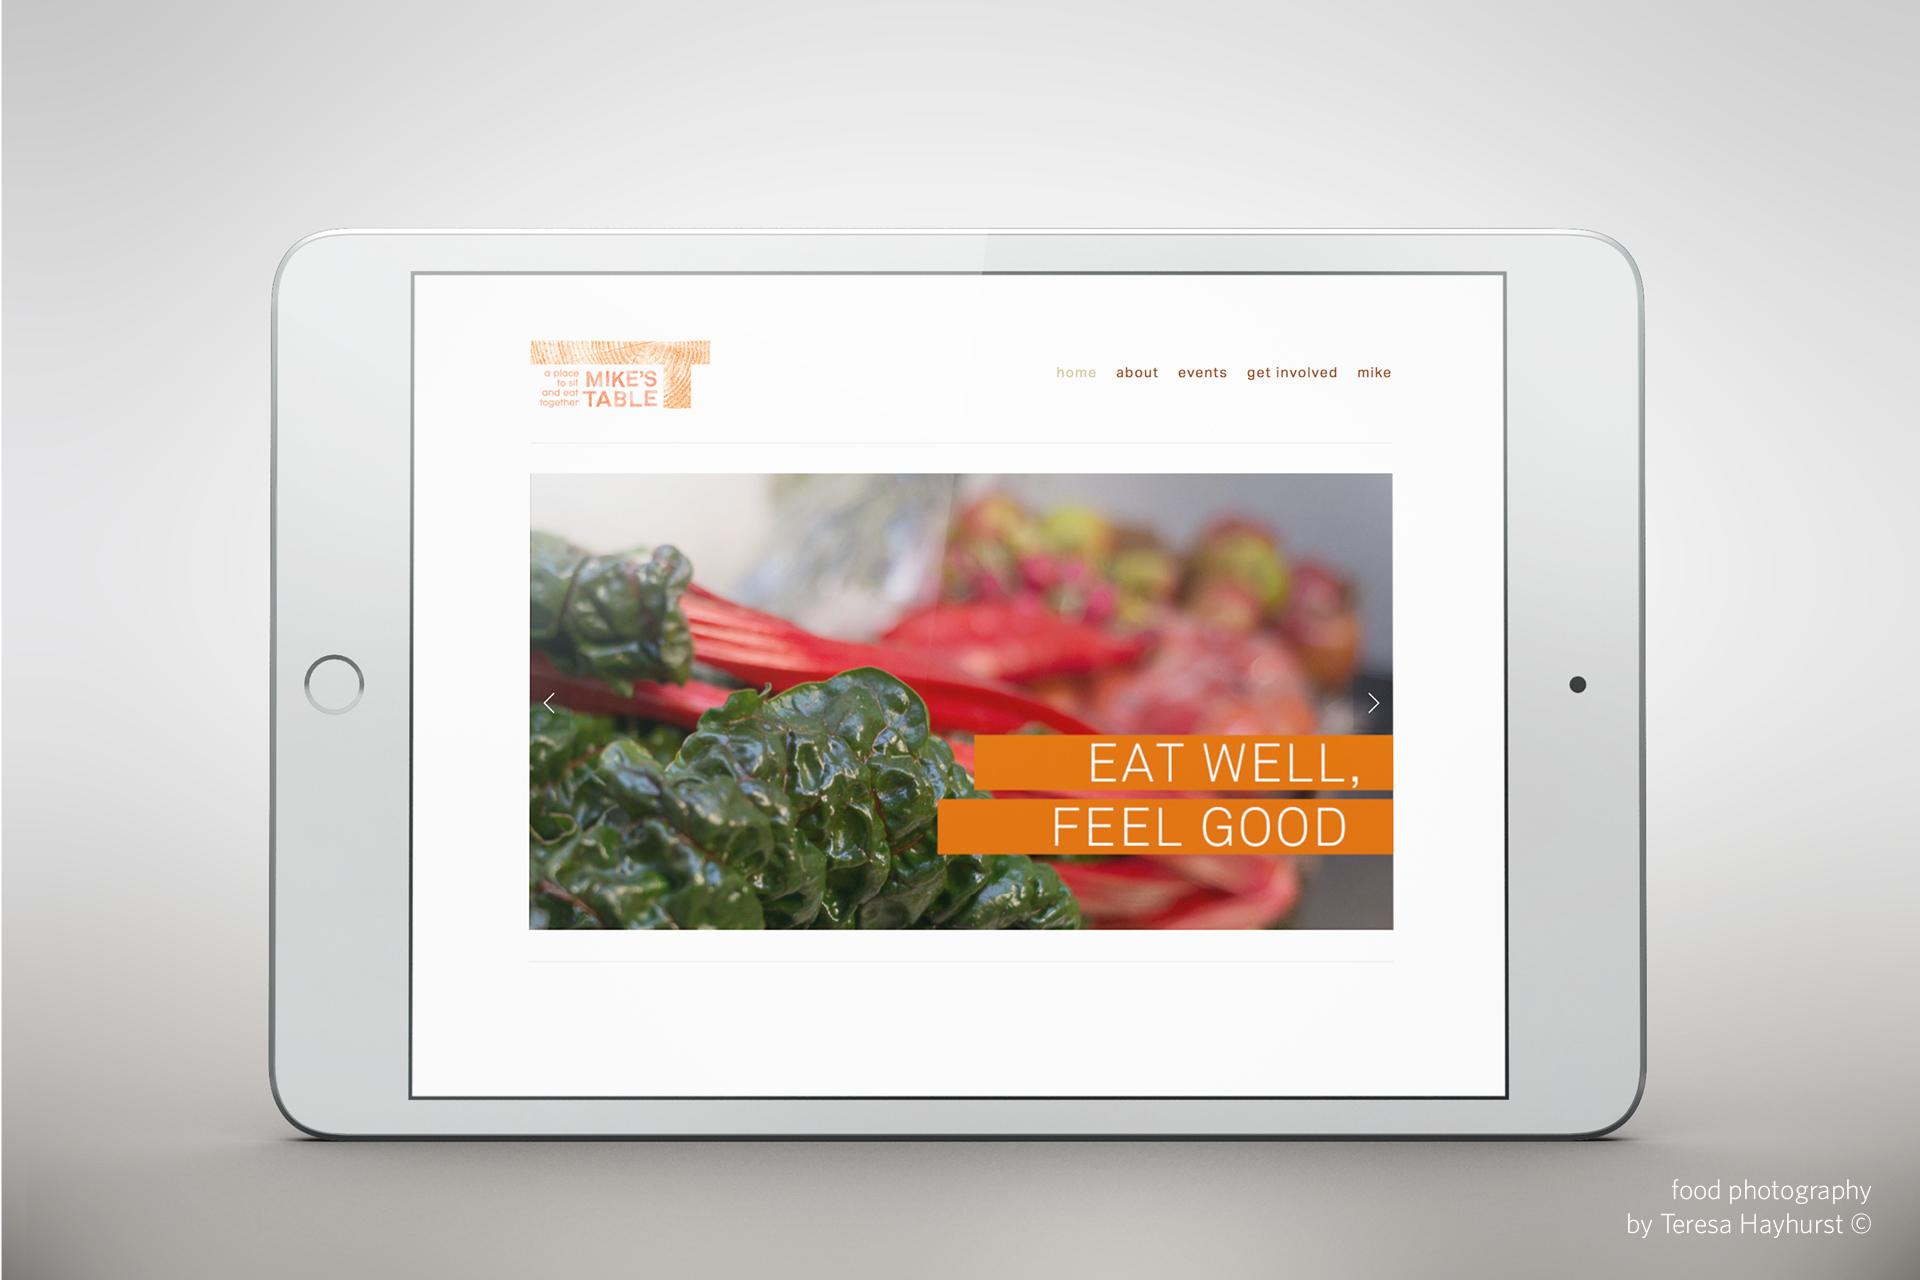 leesimmons-home-mikes-table-branding-visual-identity-design3.jpg